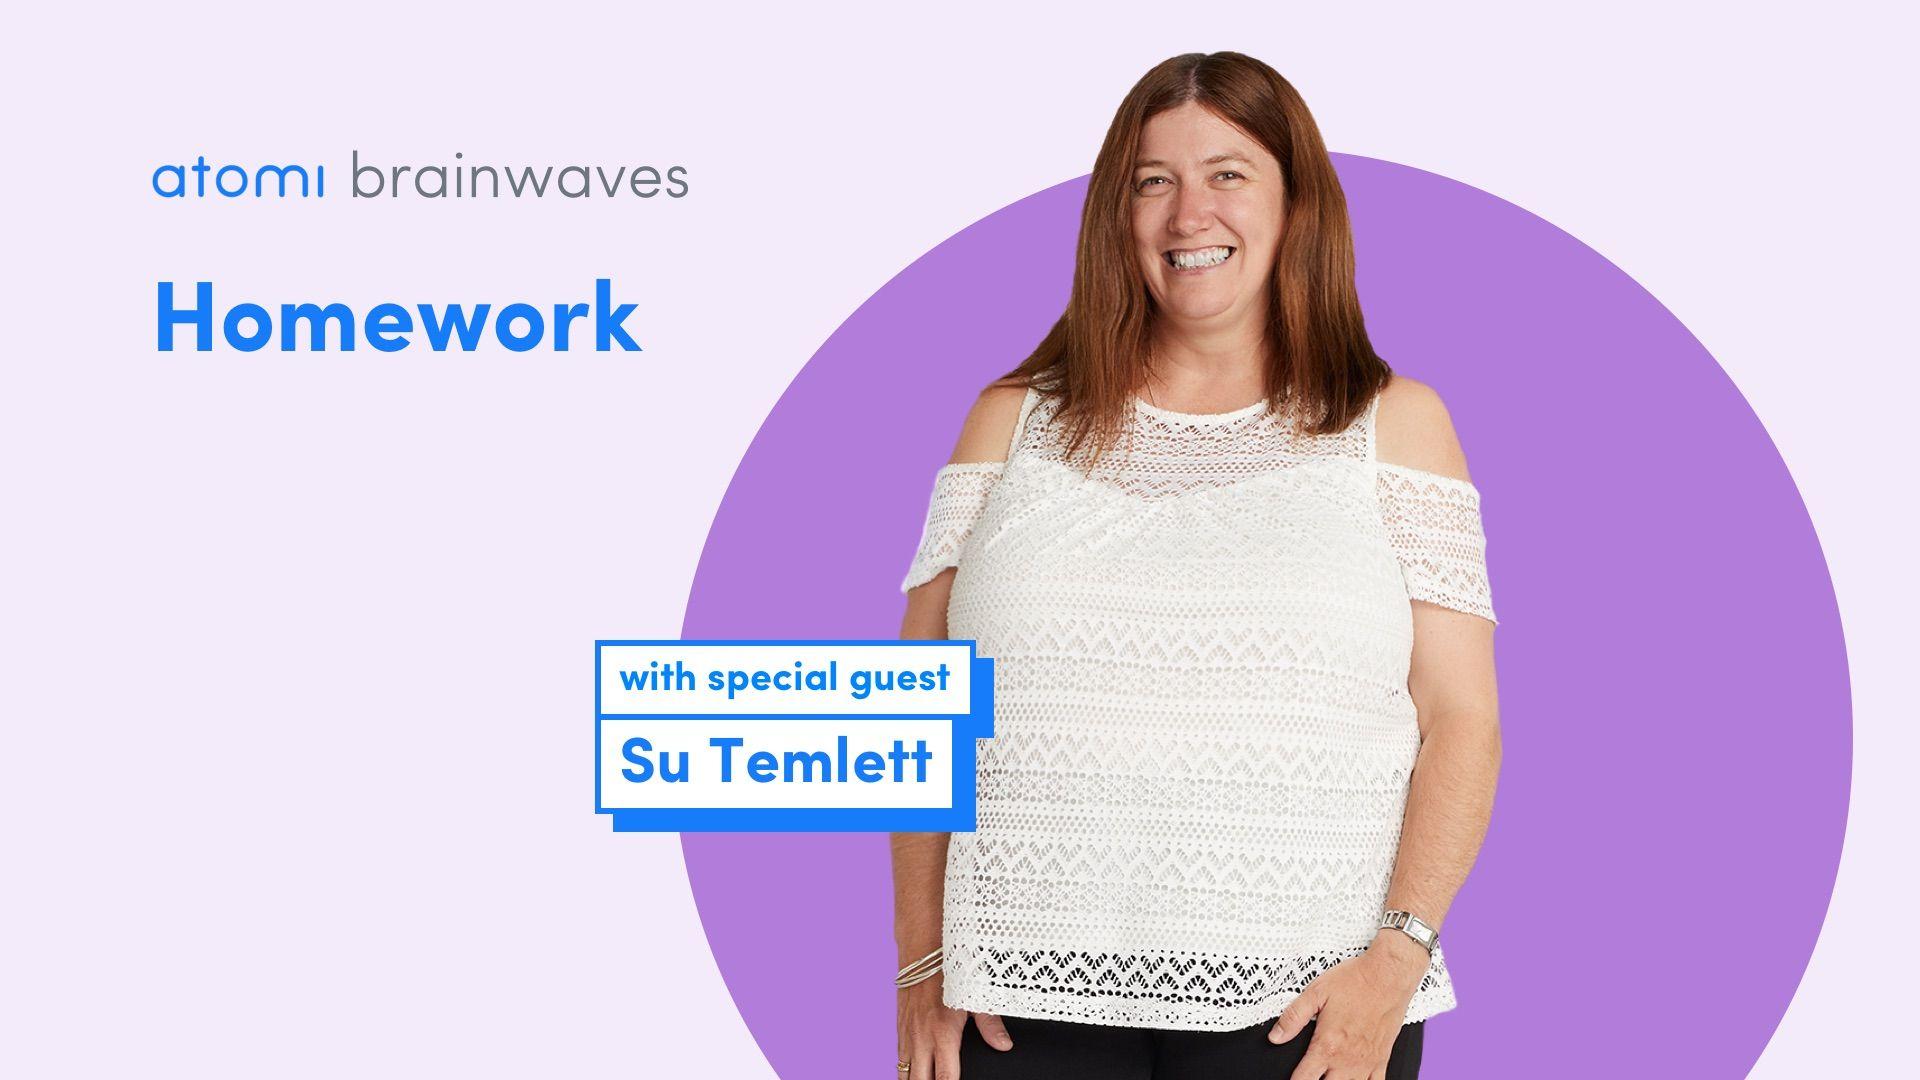 Atomi Brainwaves Podcast S1 E2: Su Temlett on Homework